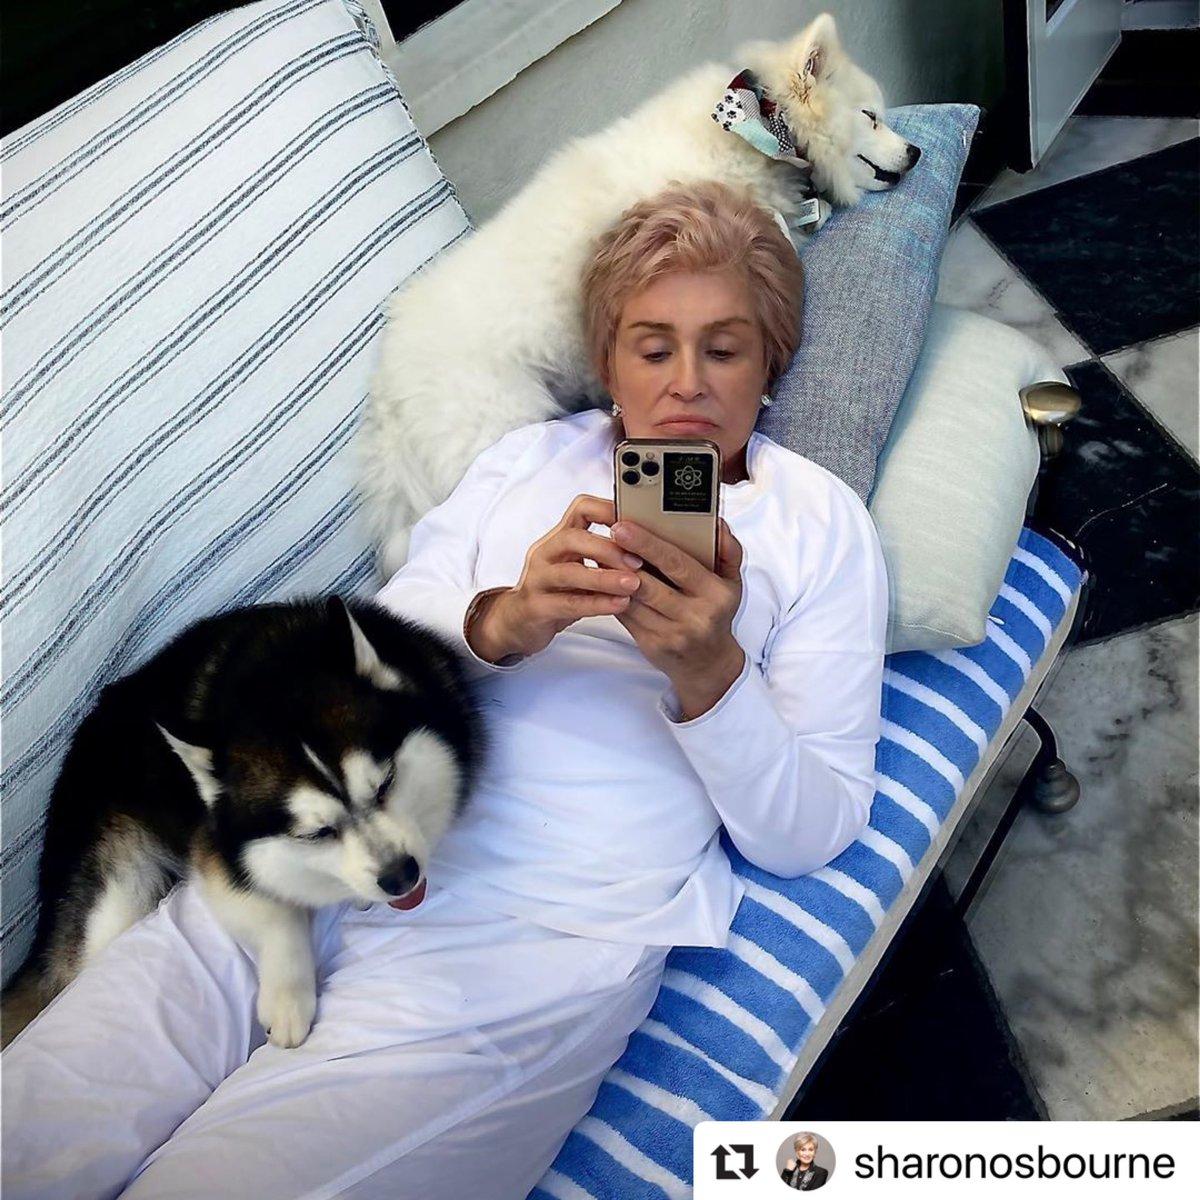 Summer has officially kicked off at the Osbourne household! #PuppyPower 🐶🐱 📷: @MrsSOsbourne https://t.co/U7kihtfg21